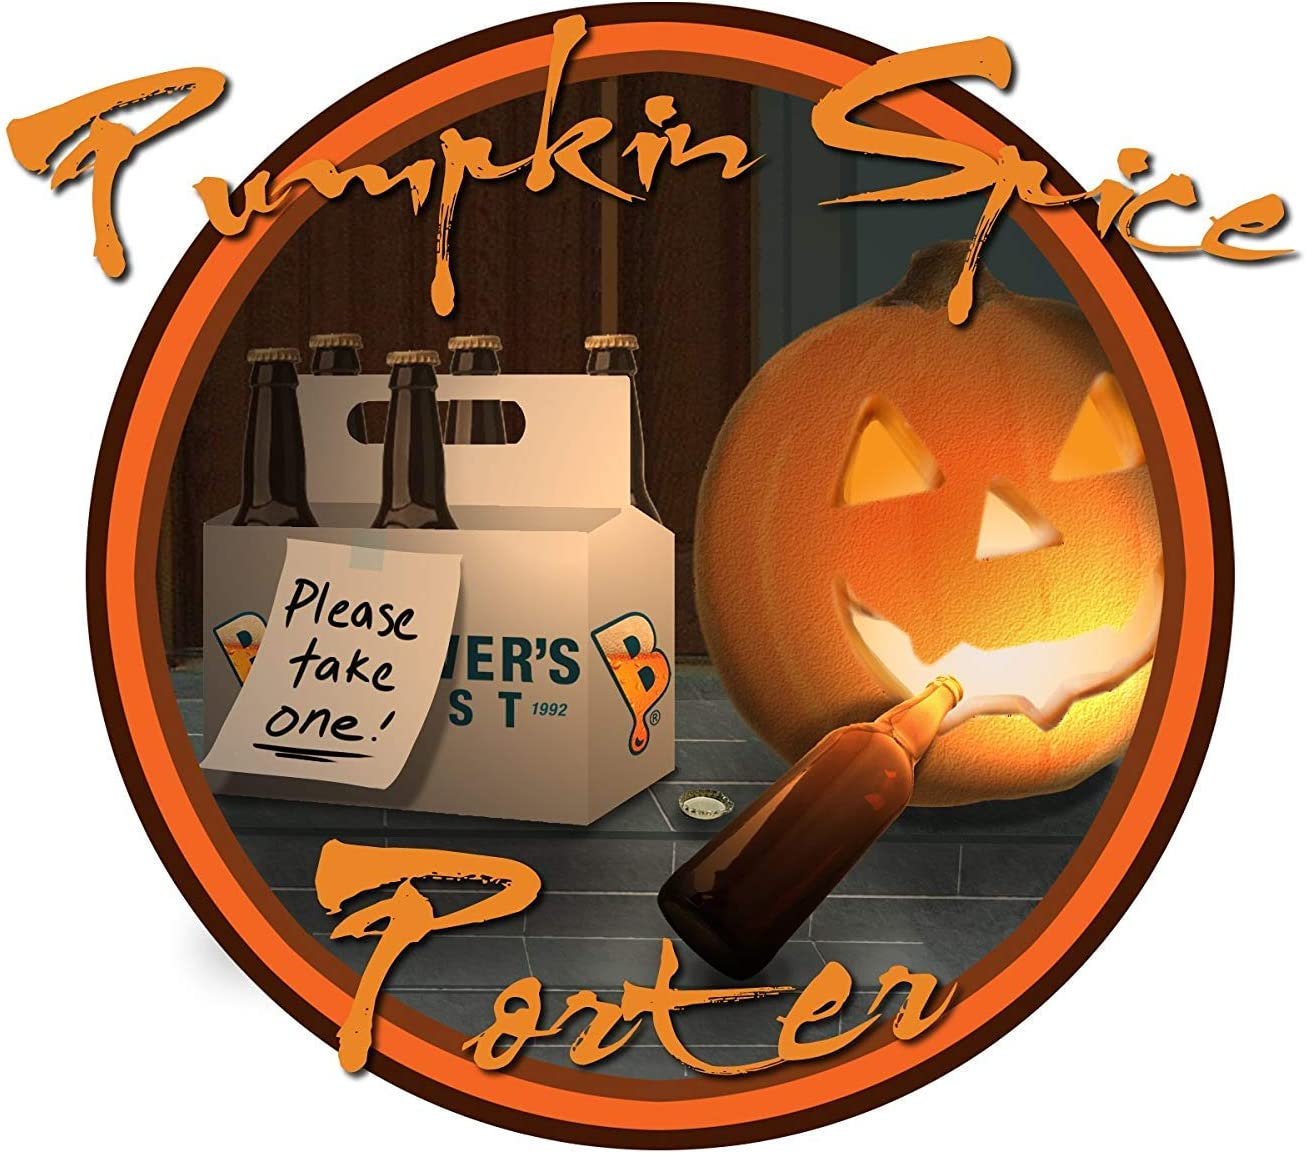 Brewer's Best - Home Brew Beer Ingredient Kit (5 gallon), (Pumpkin Spice Porter - Seasonal)